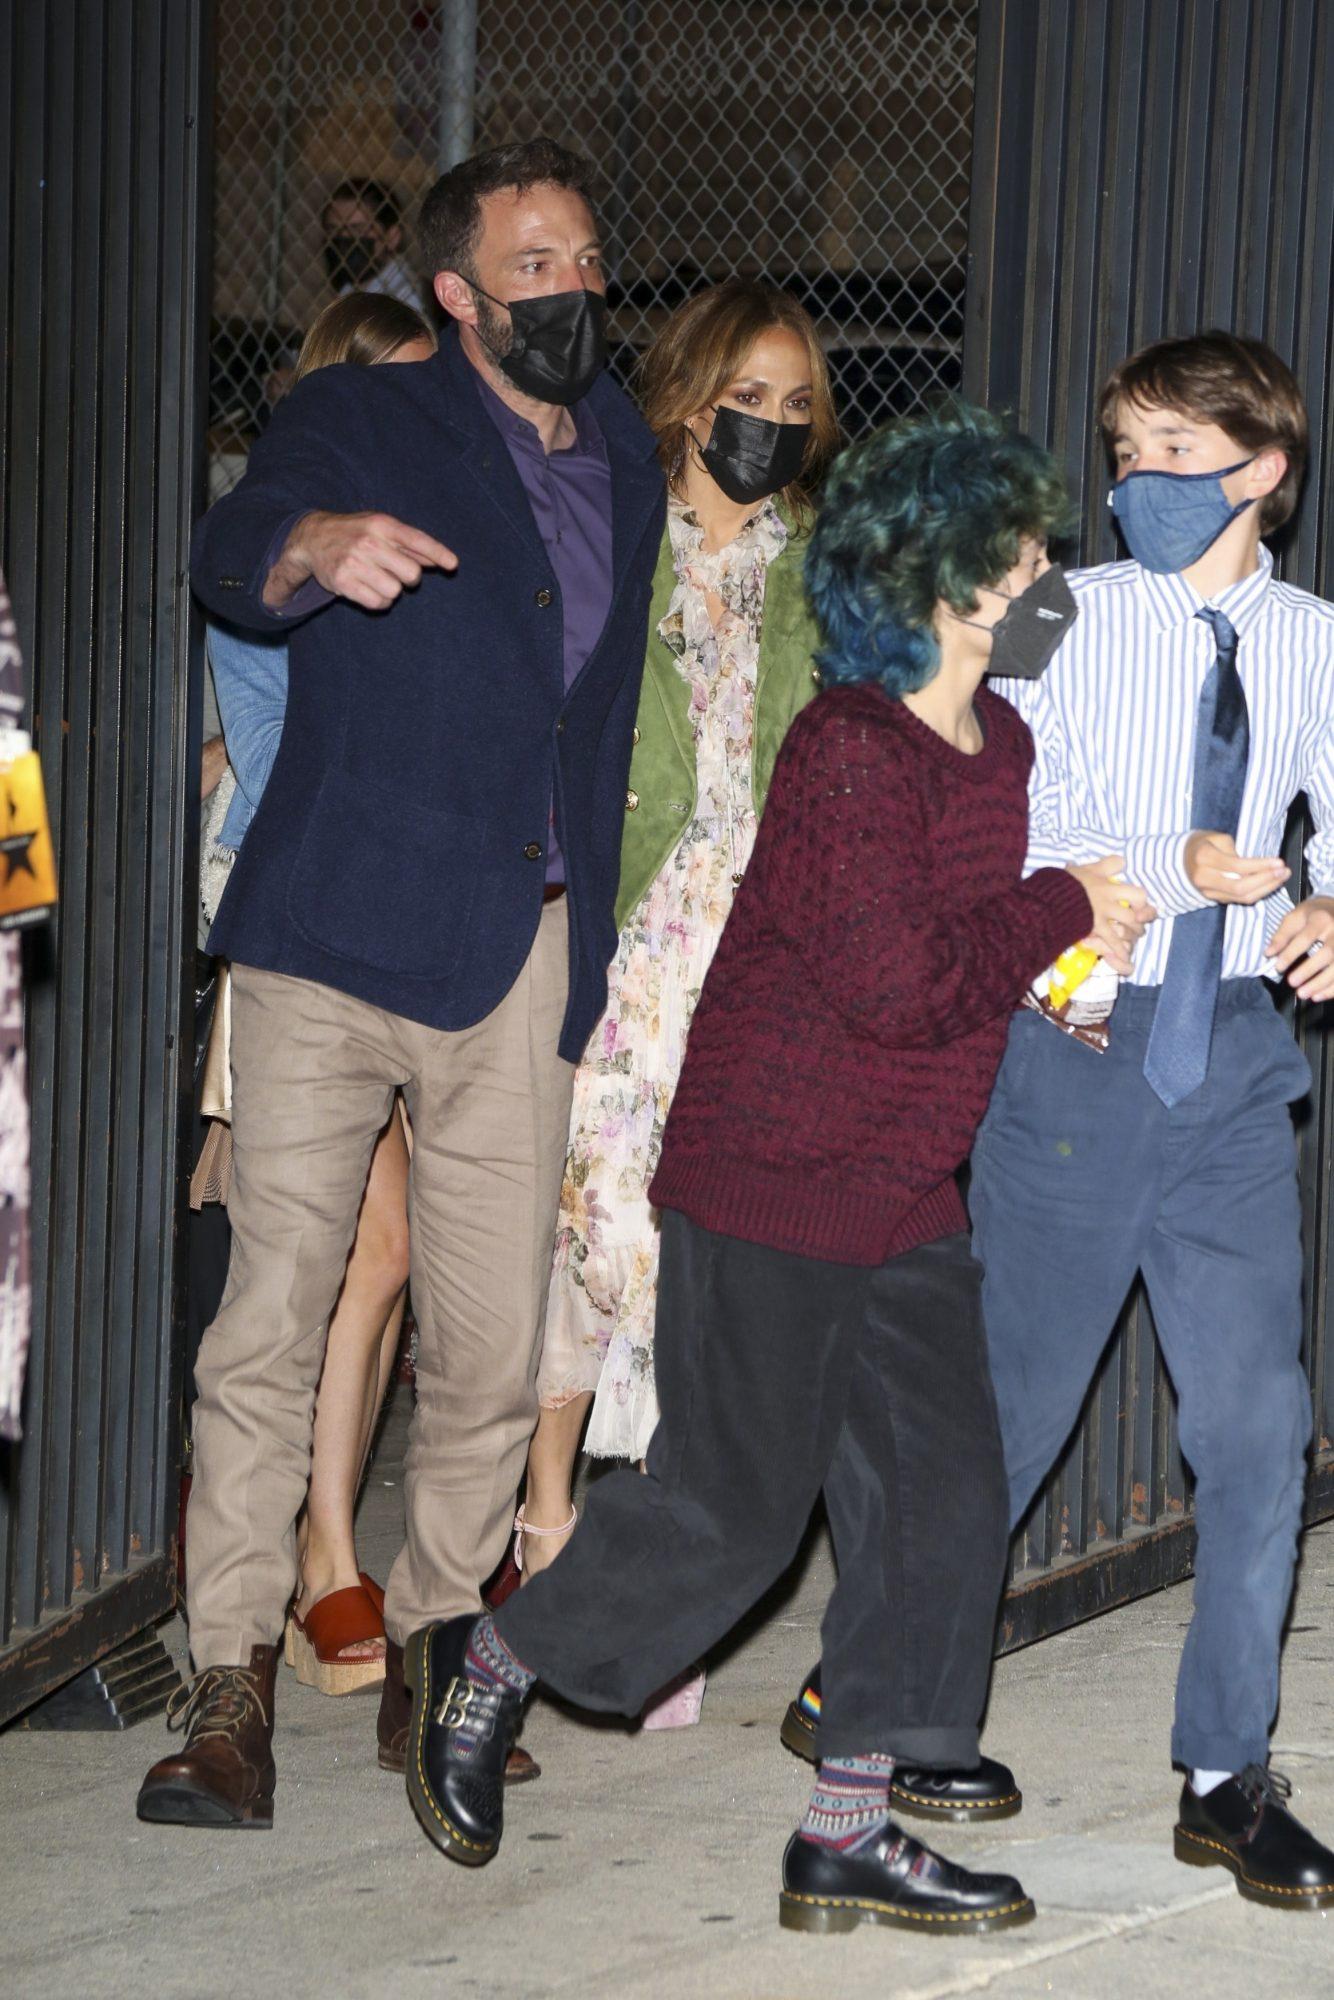 Ben Affleck and Jennifer Lopez Take the Kids to Watch Hamilton